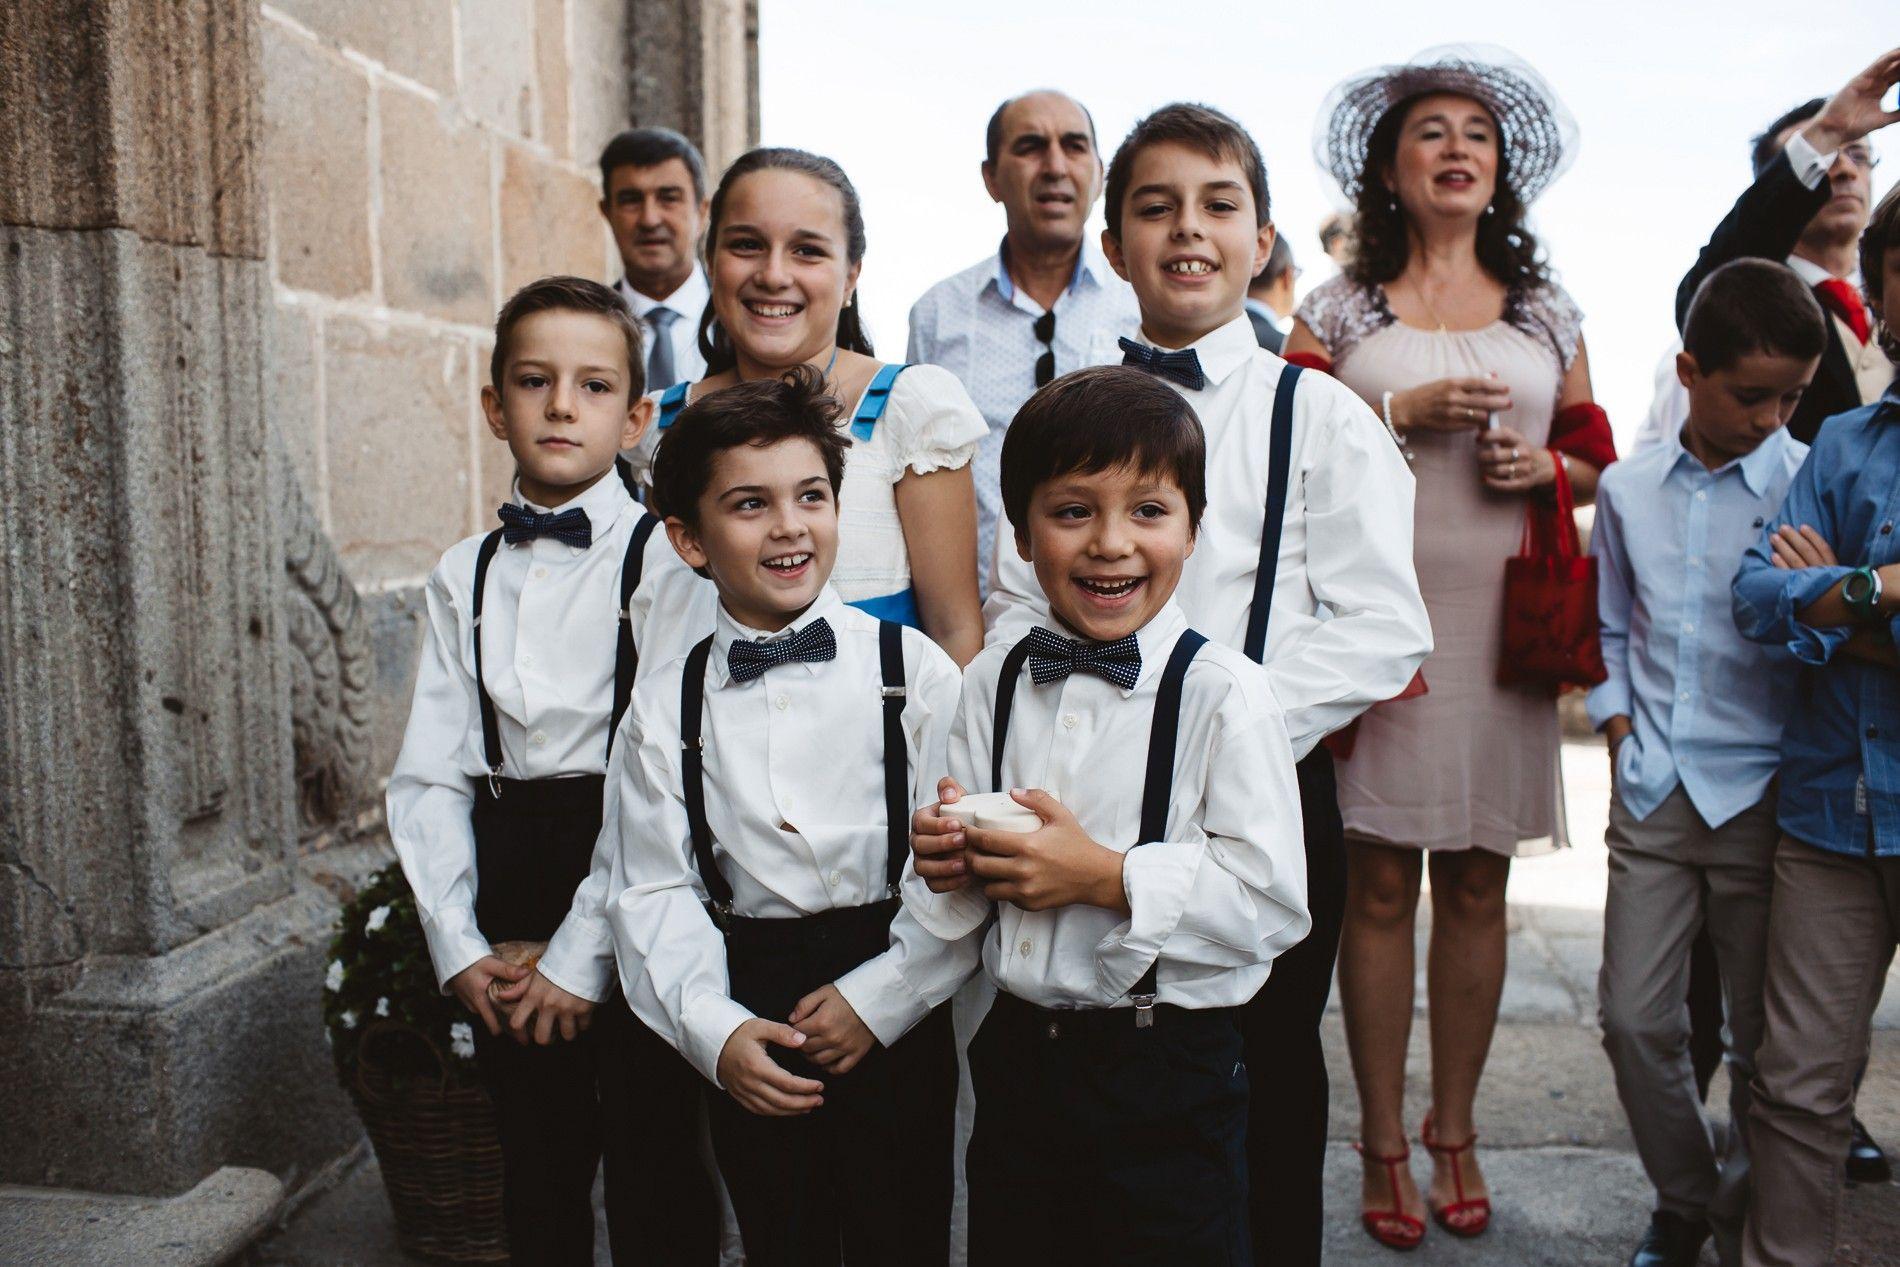 fotografo-de-boda-plasencia-17